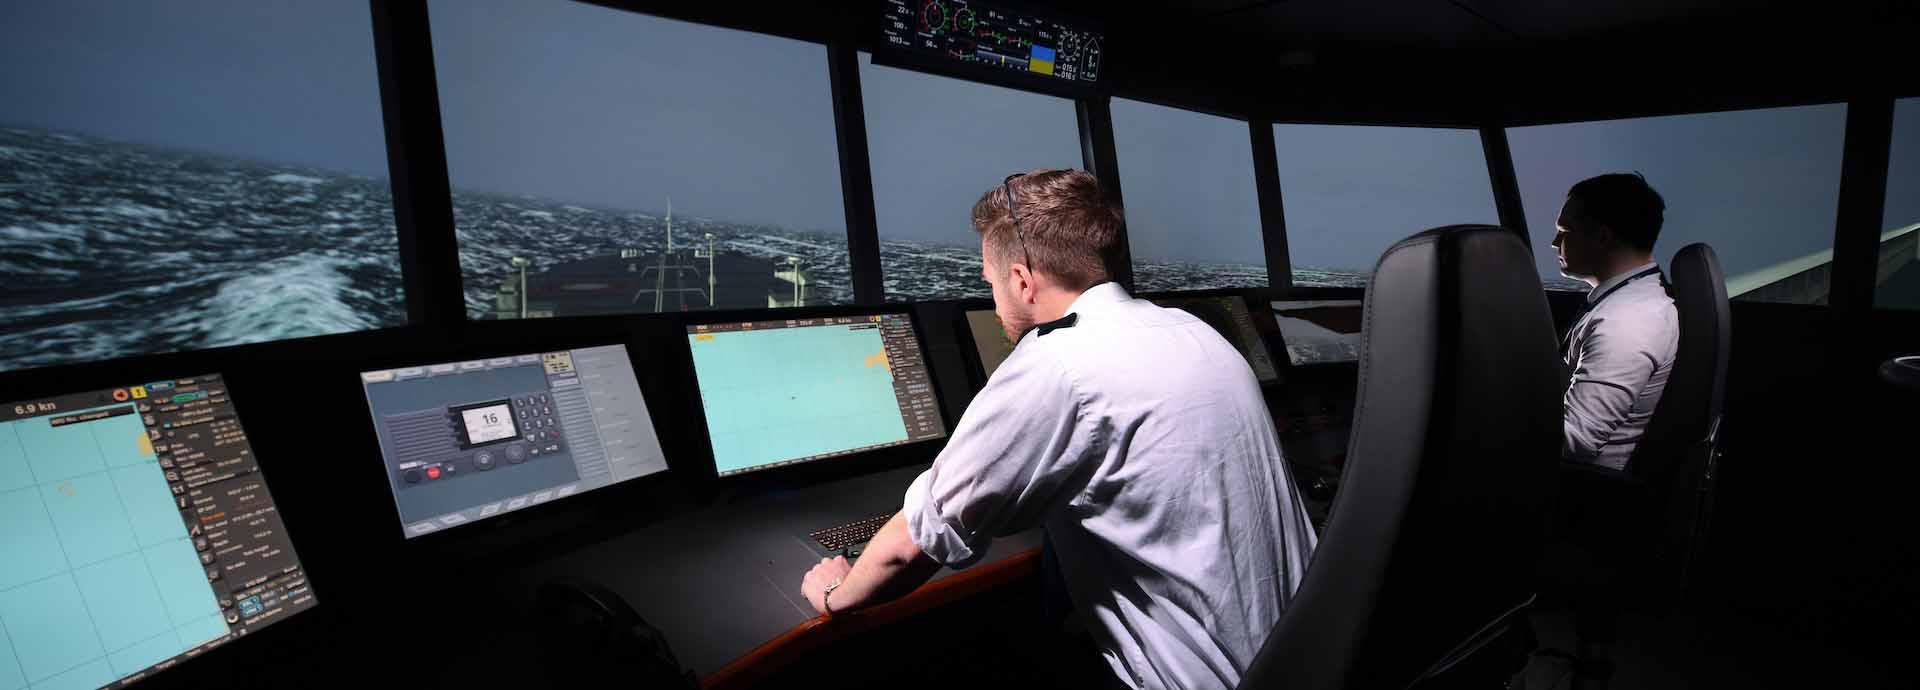 Solent University, ship simulation training